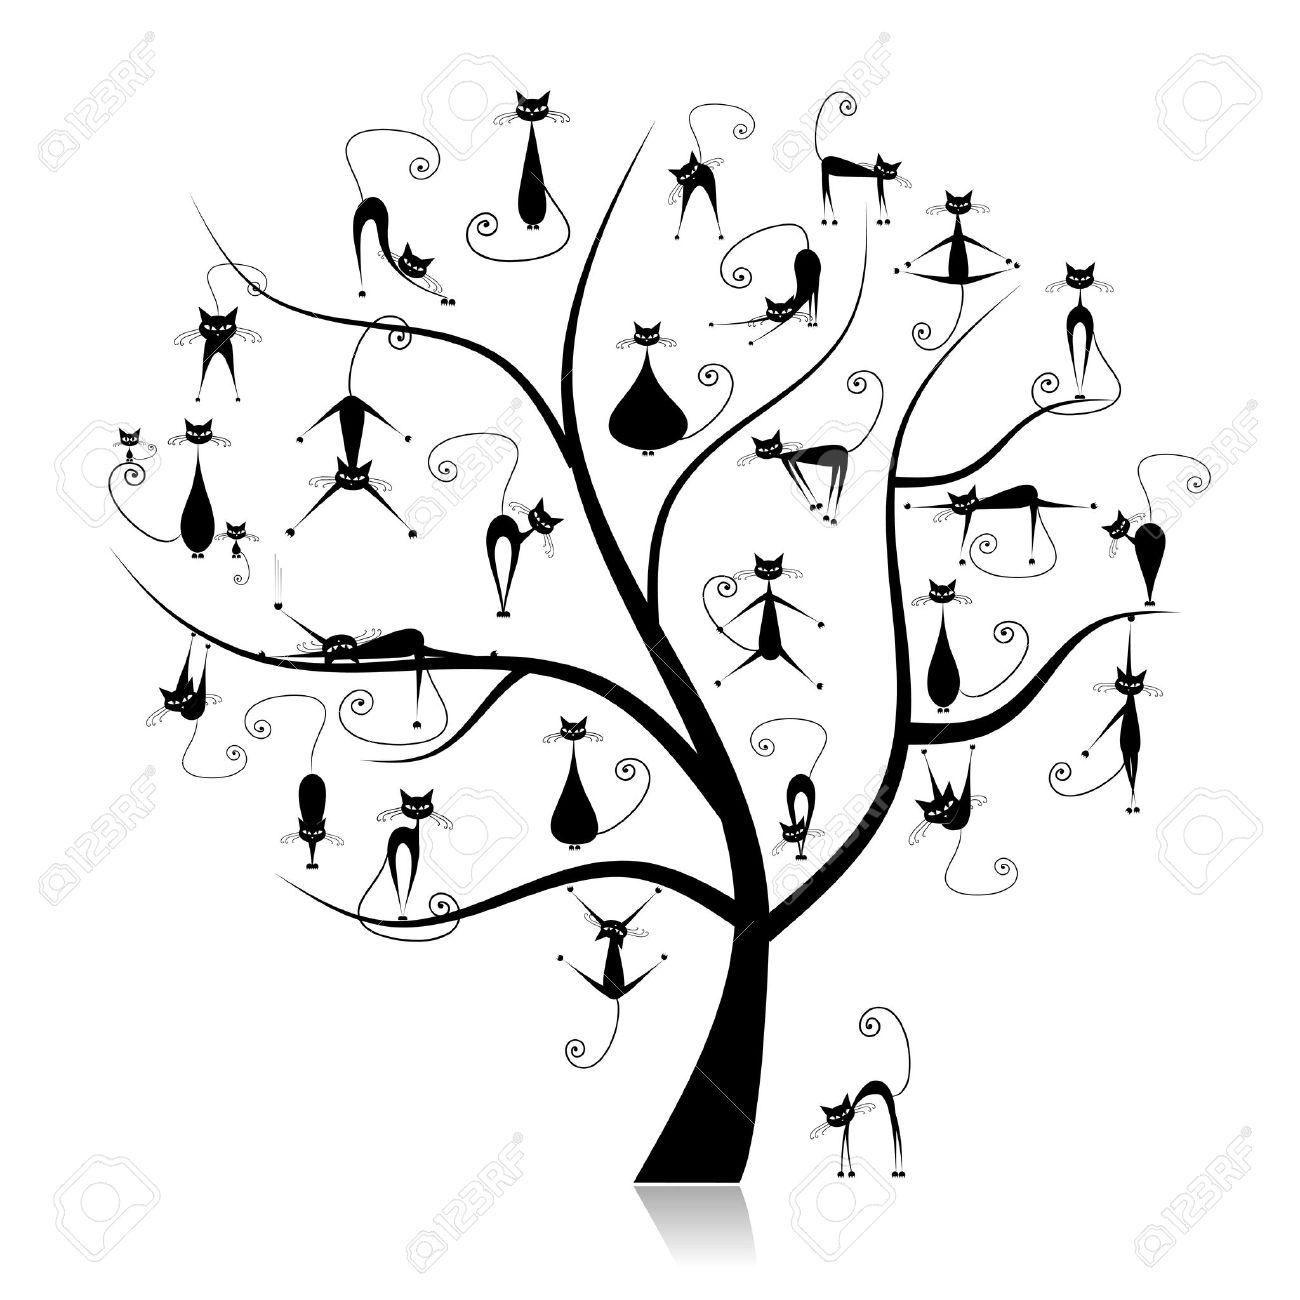 Family cats tree, 27 black silhouettes funny Stock Vector - 6927726